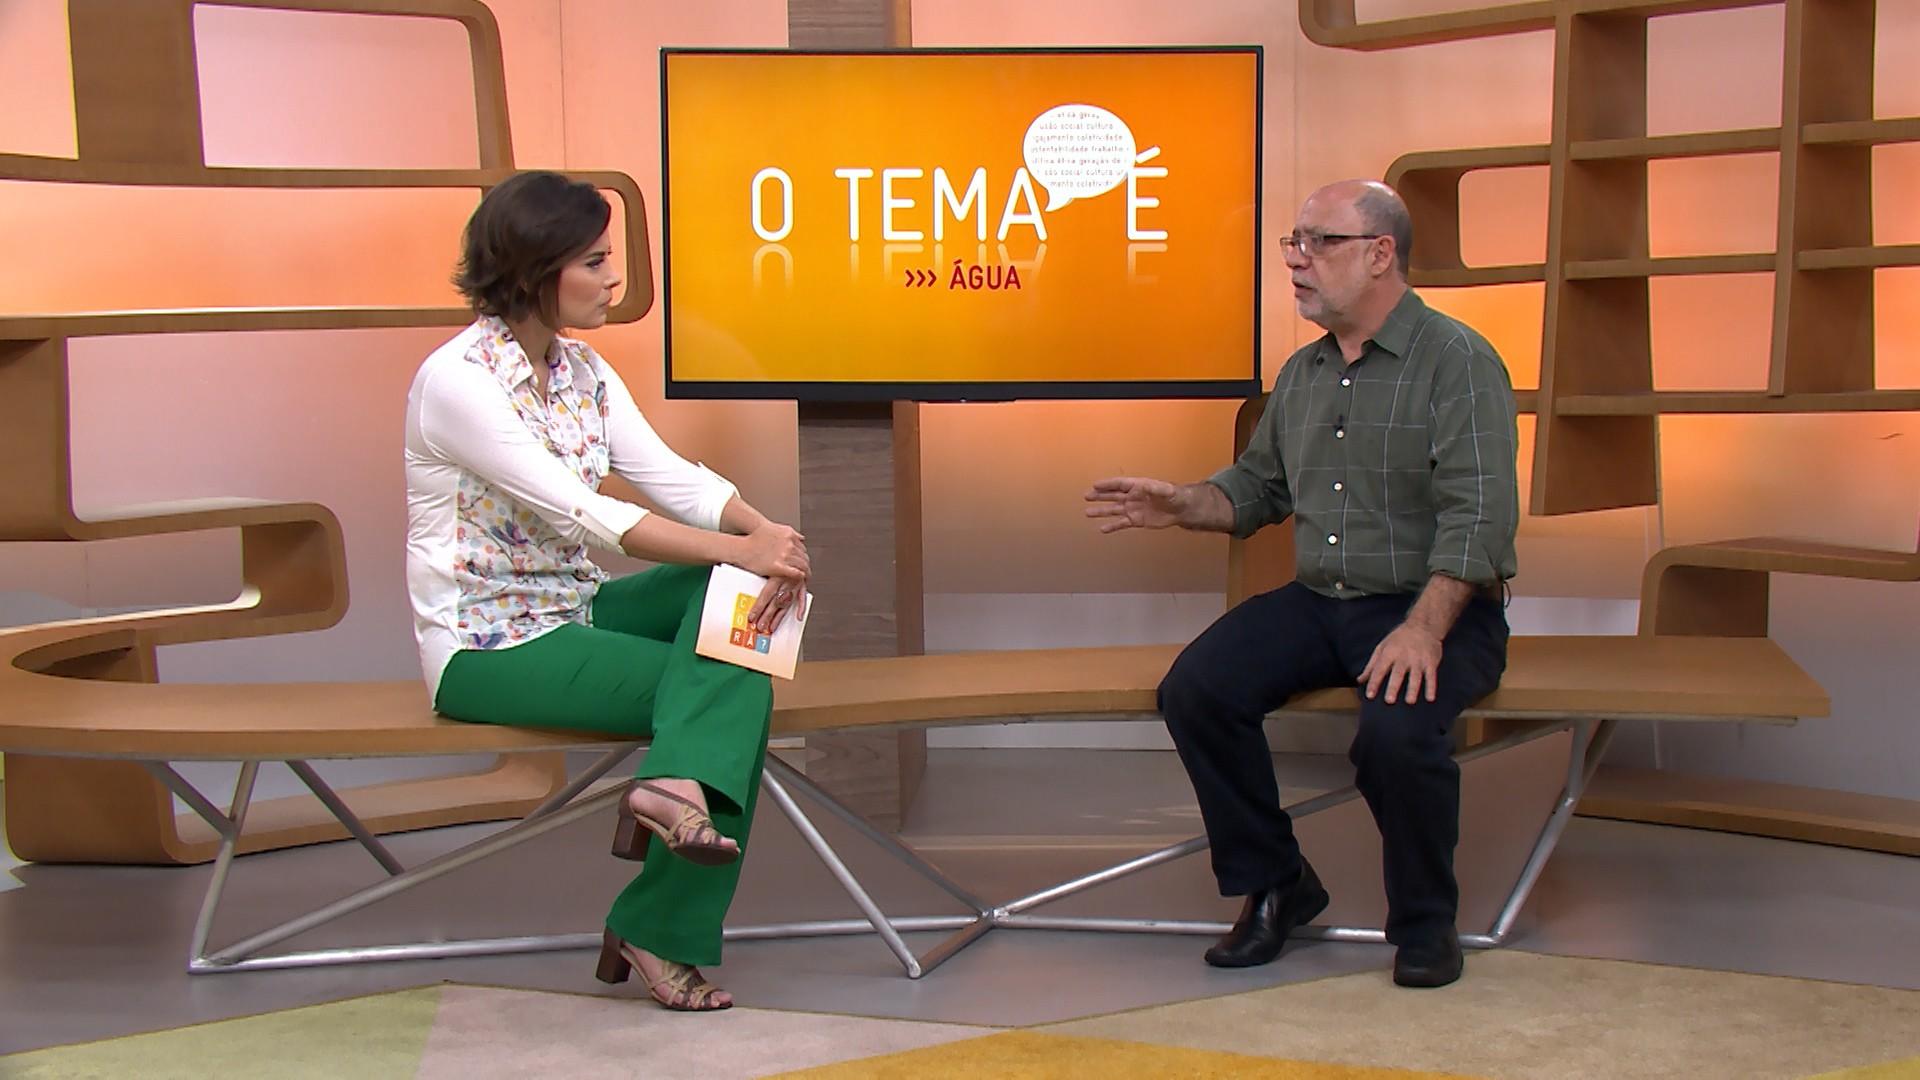 Michelle Loreto recebe o ambientalista e economista Sérgio Besserman no estúdio do Como Será? (Foto: Globo)